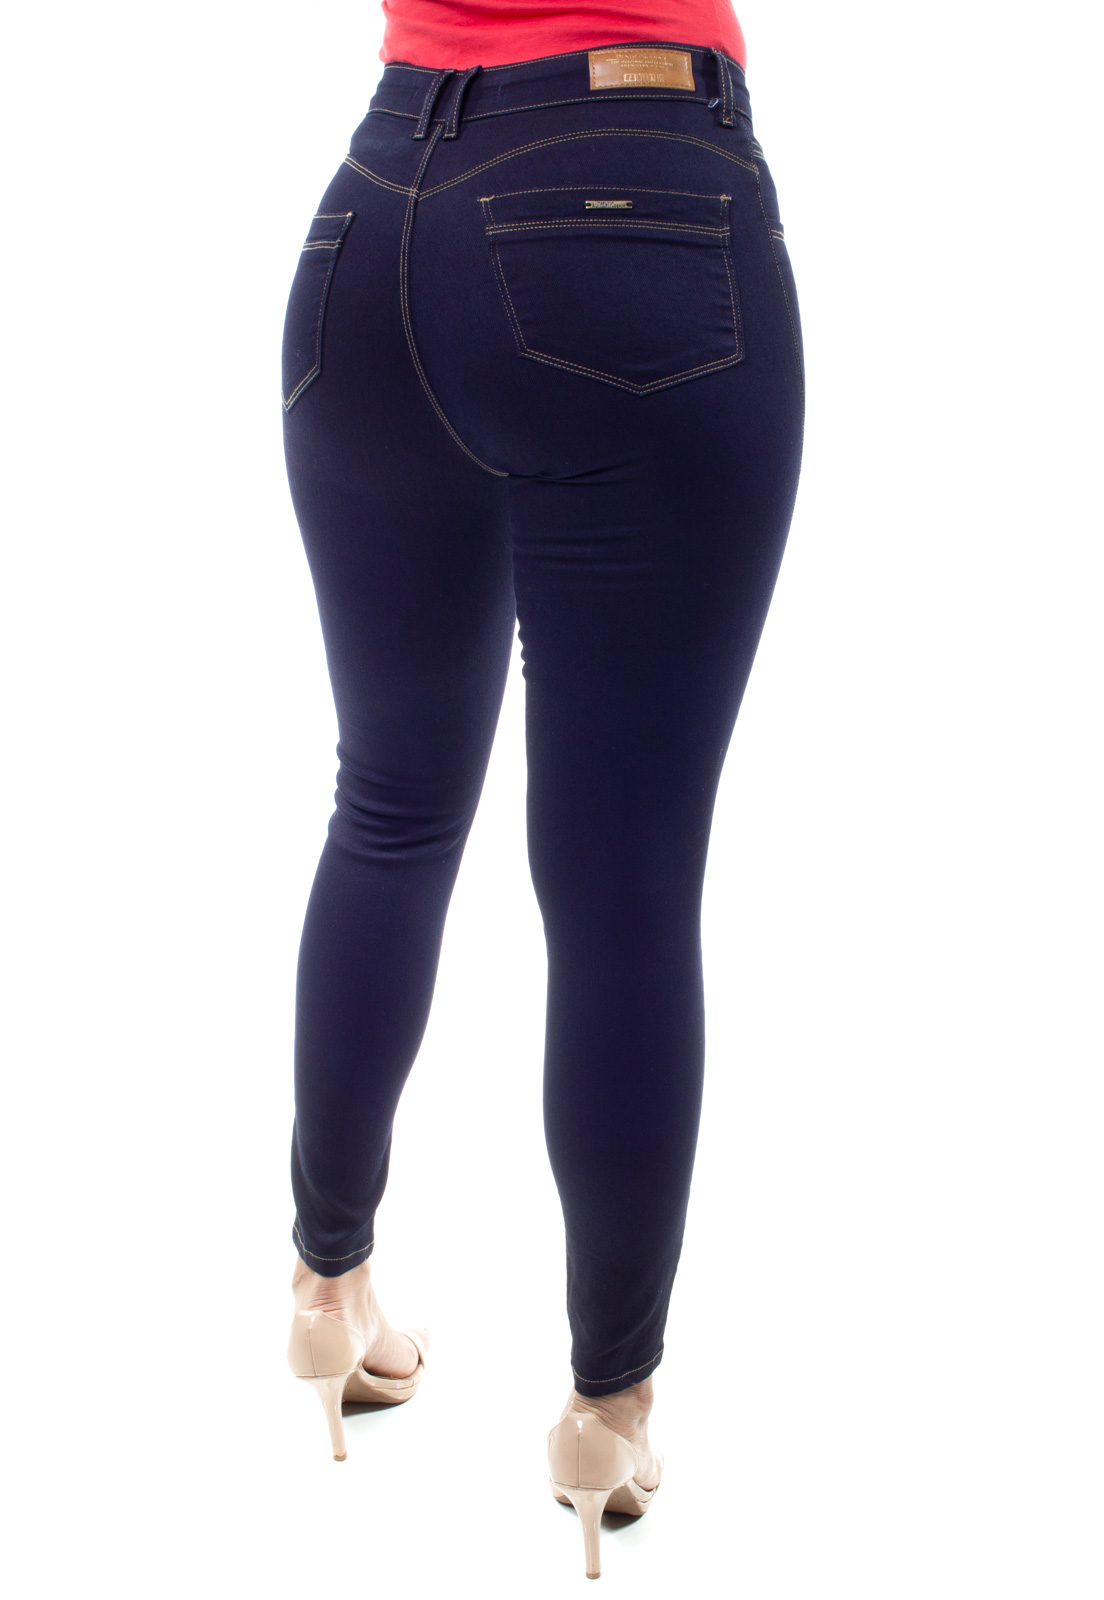 Cigarrete  Jeans Feminina Crocker - 48386  - CROCKER JEANS